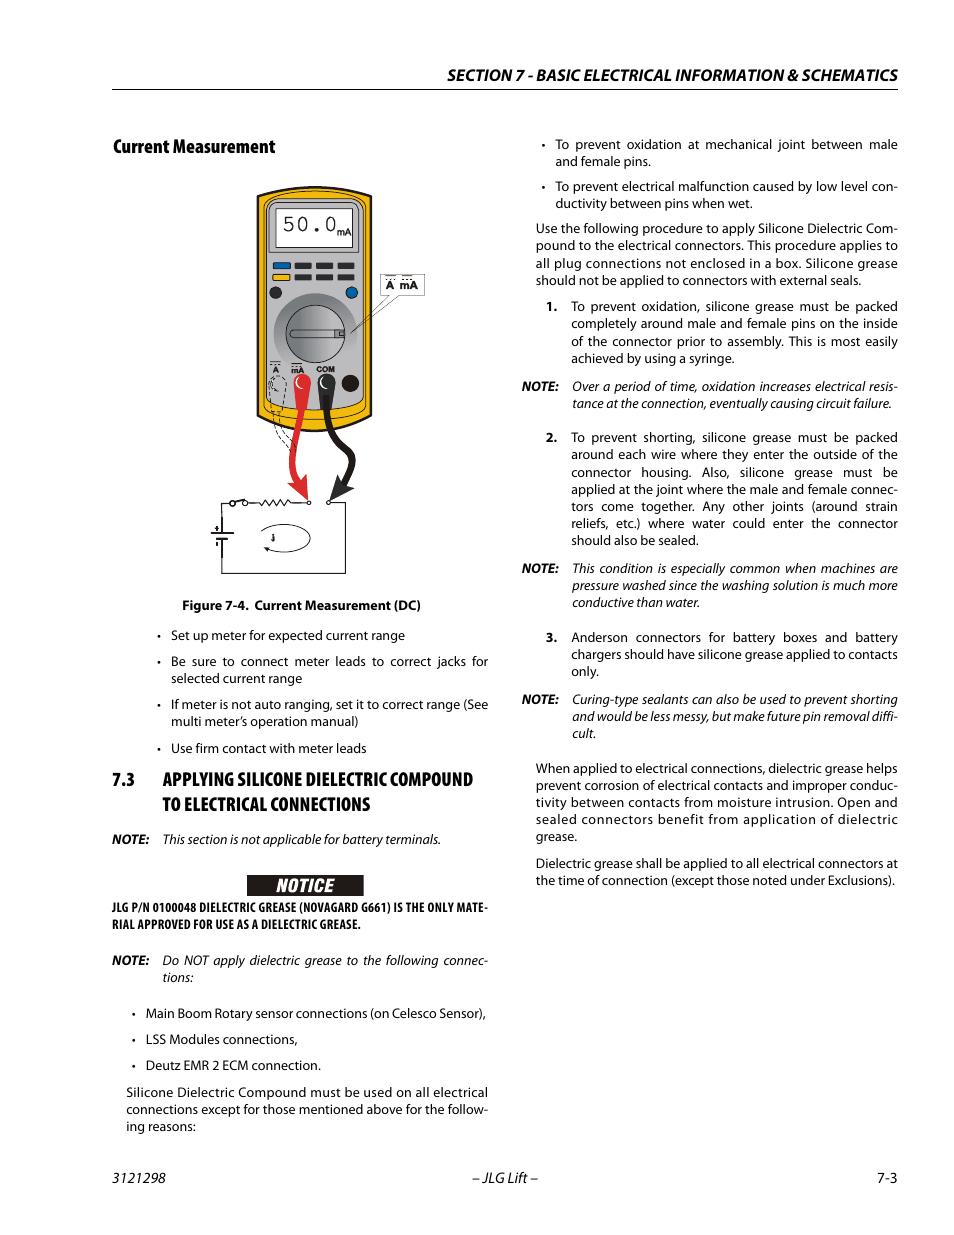 medium resolution of current measurement current measurement 3 current measurement dc 3 jlg 660sj service manual user manual page 303 328